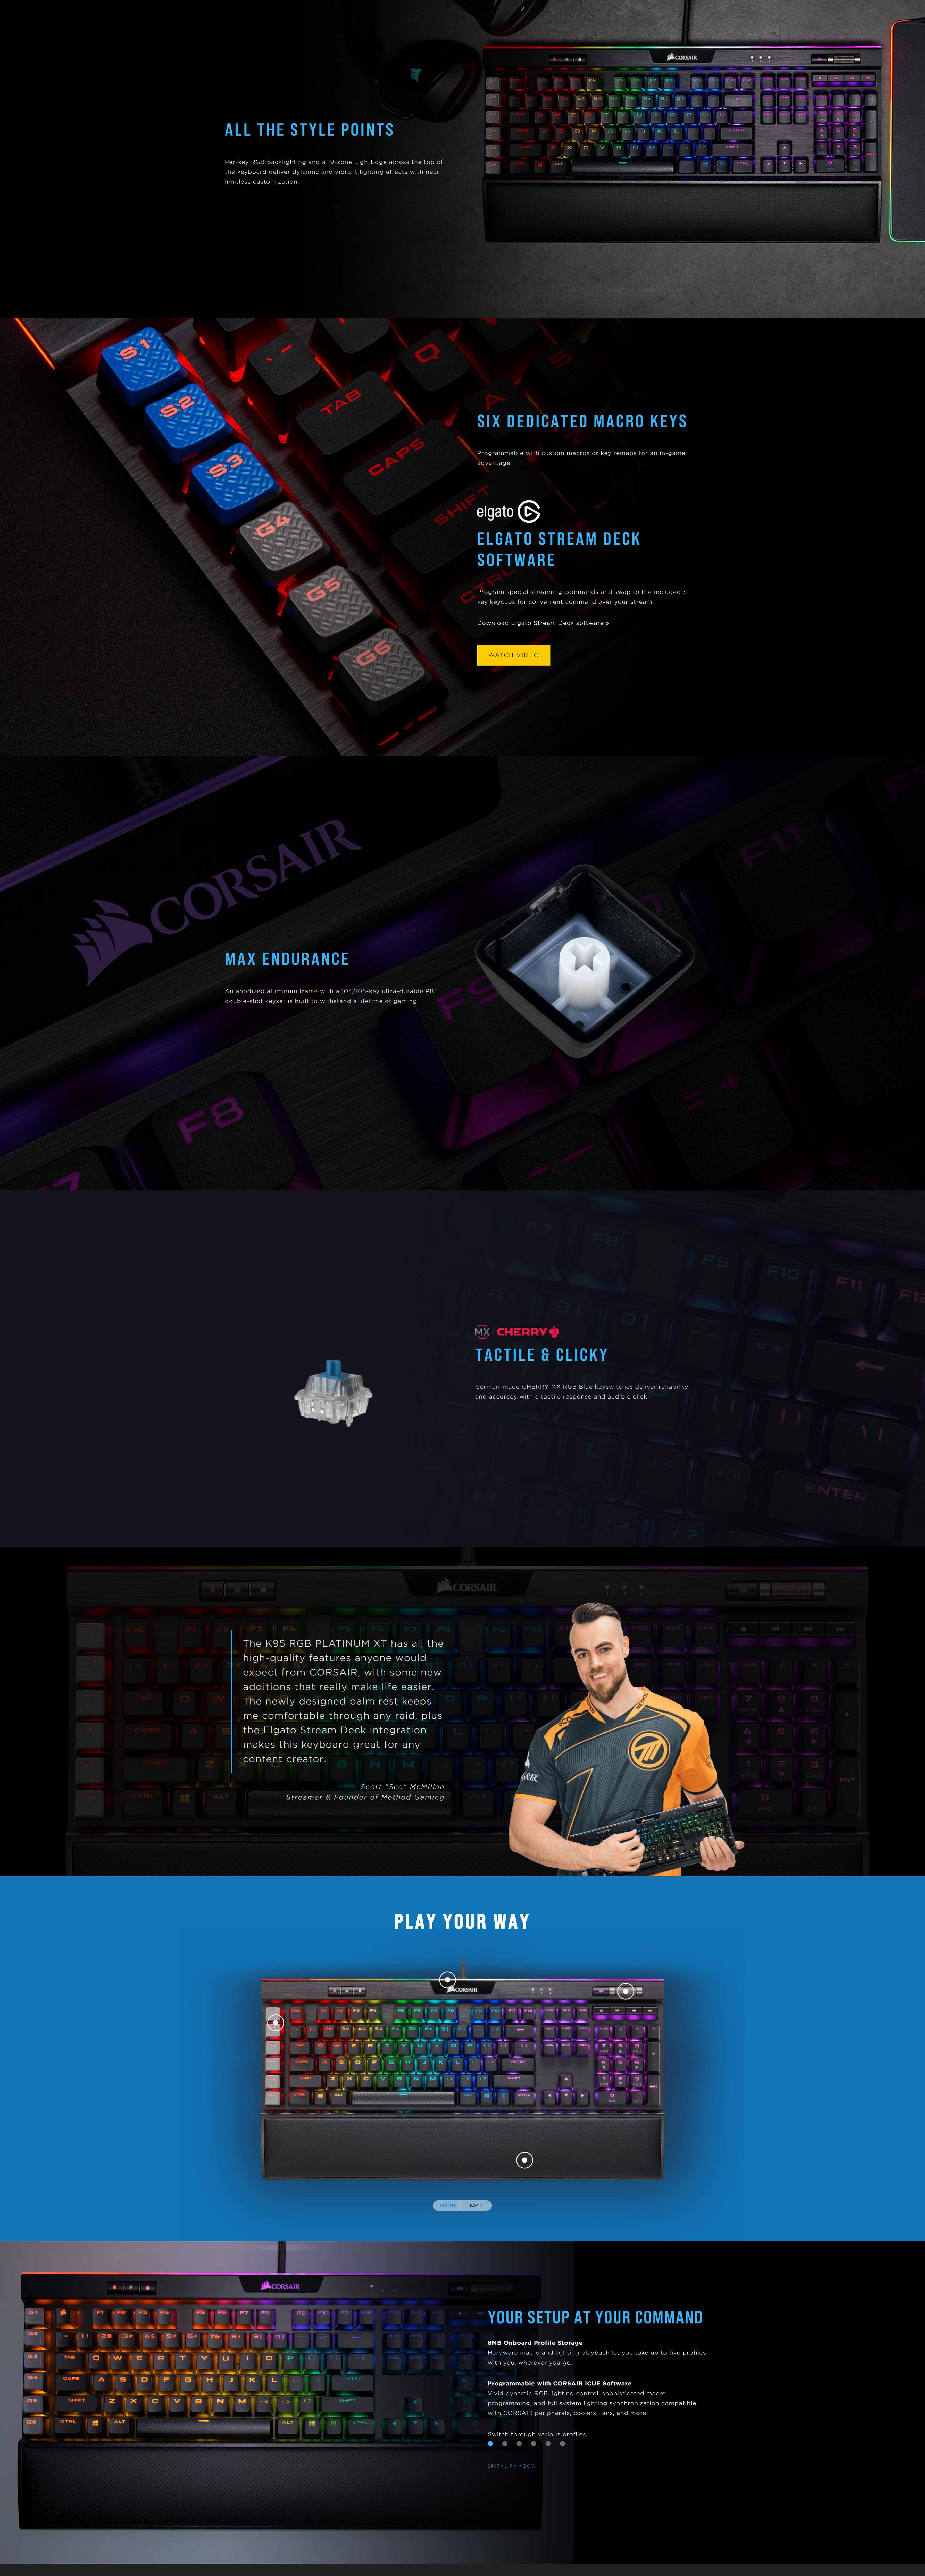 screencapture-corsair-us-en-Categories-Products-Gaming-Keyboards-RGB-Mechanical-Gaming-Keyboards-K95-RGB-PLATINUM-XT-Mechanical-Gaming-Keyboard-p-CH-9127411-.jpg